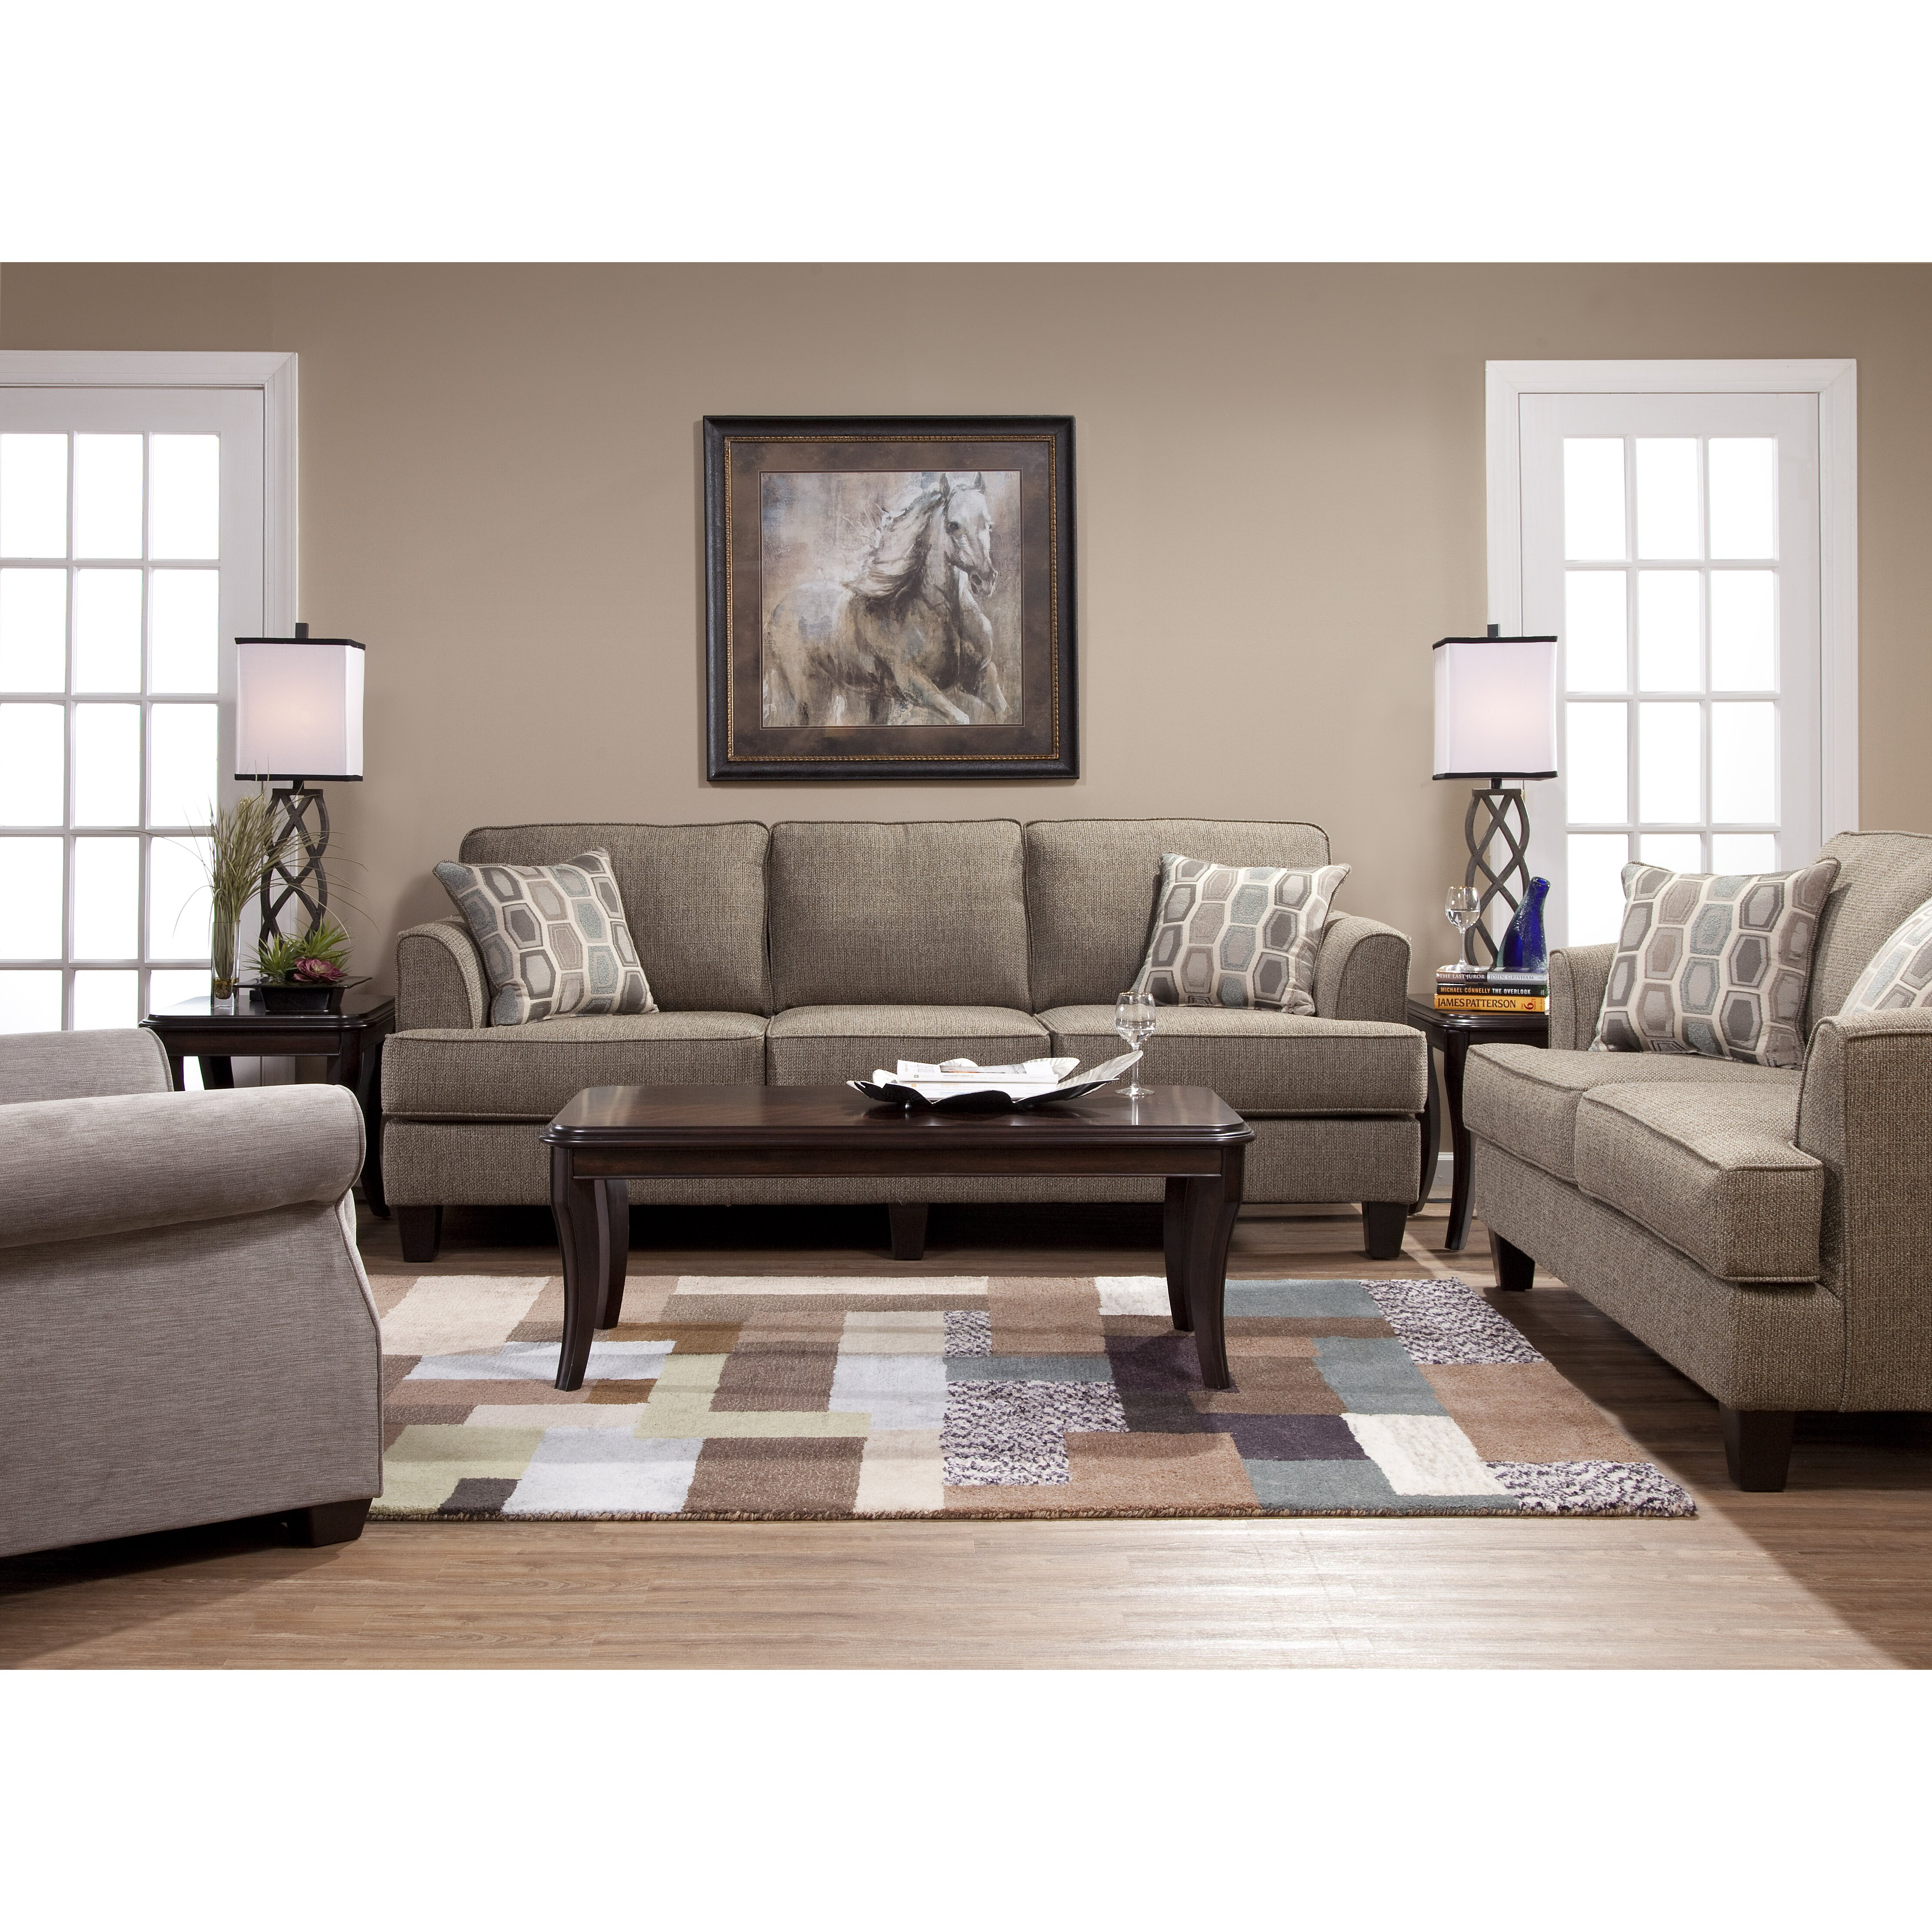 Red Barrel Studio Serta Upholstery Dallas Sofa & Reviews